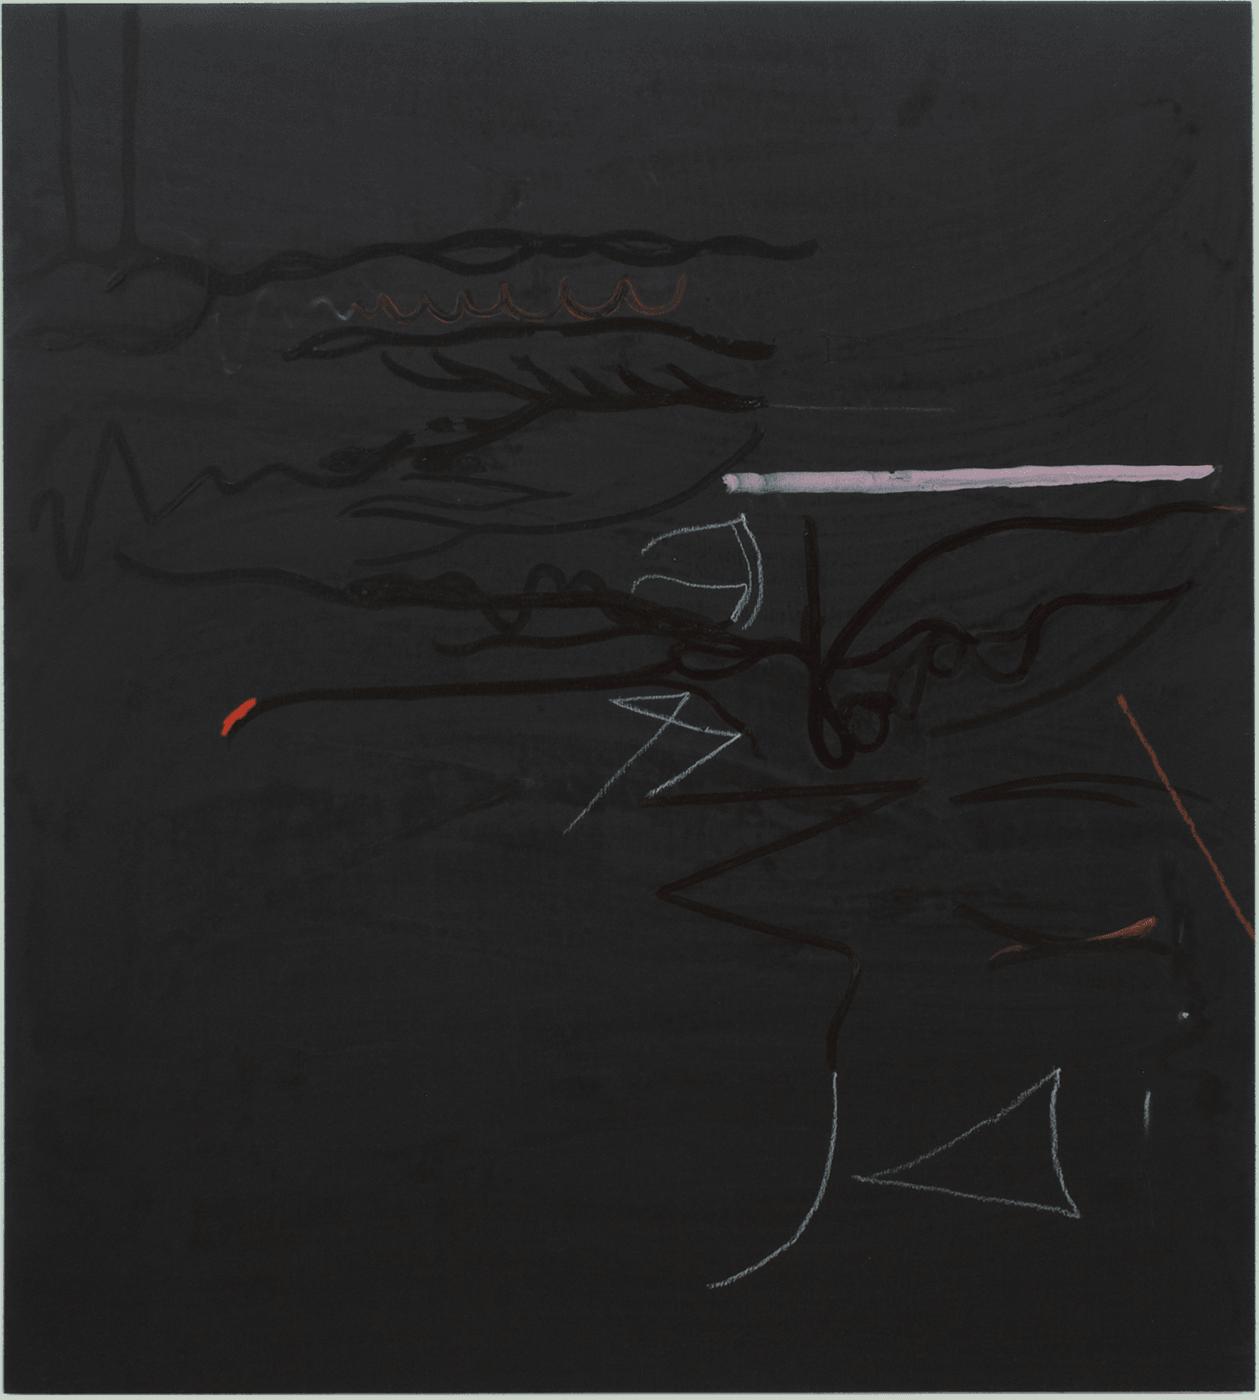 Erika Krause: Untitled, ink, pencils, marker, gesso on wood, 80x72cm, 2019